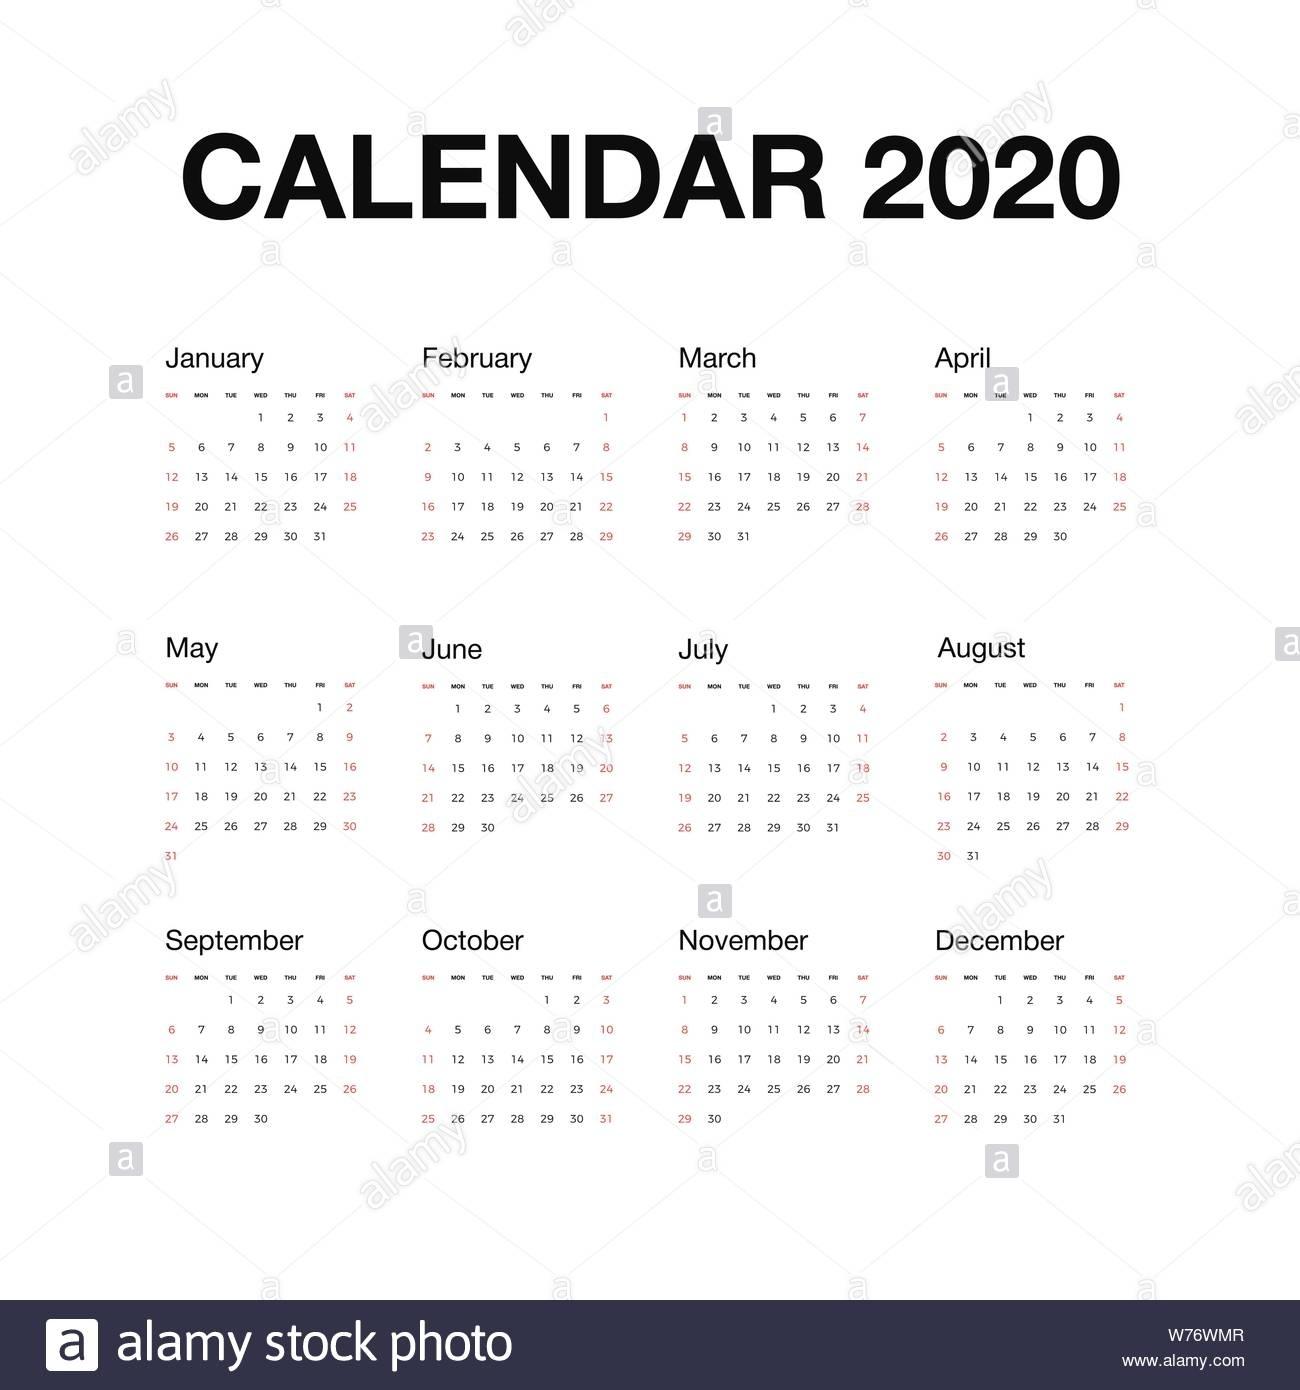 Minimalistic Desk Calendar 2020 Year. Calendar Design With